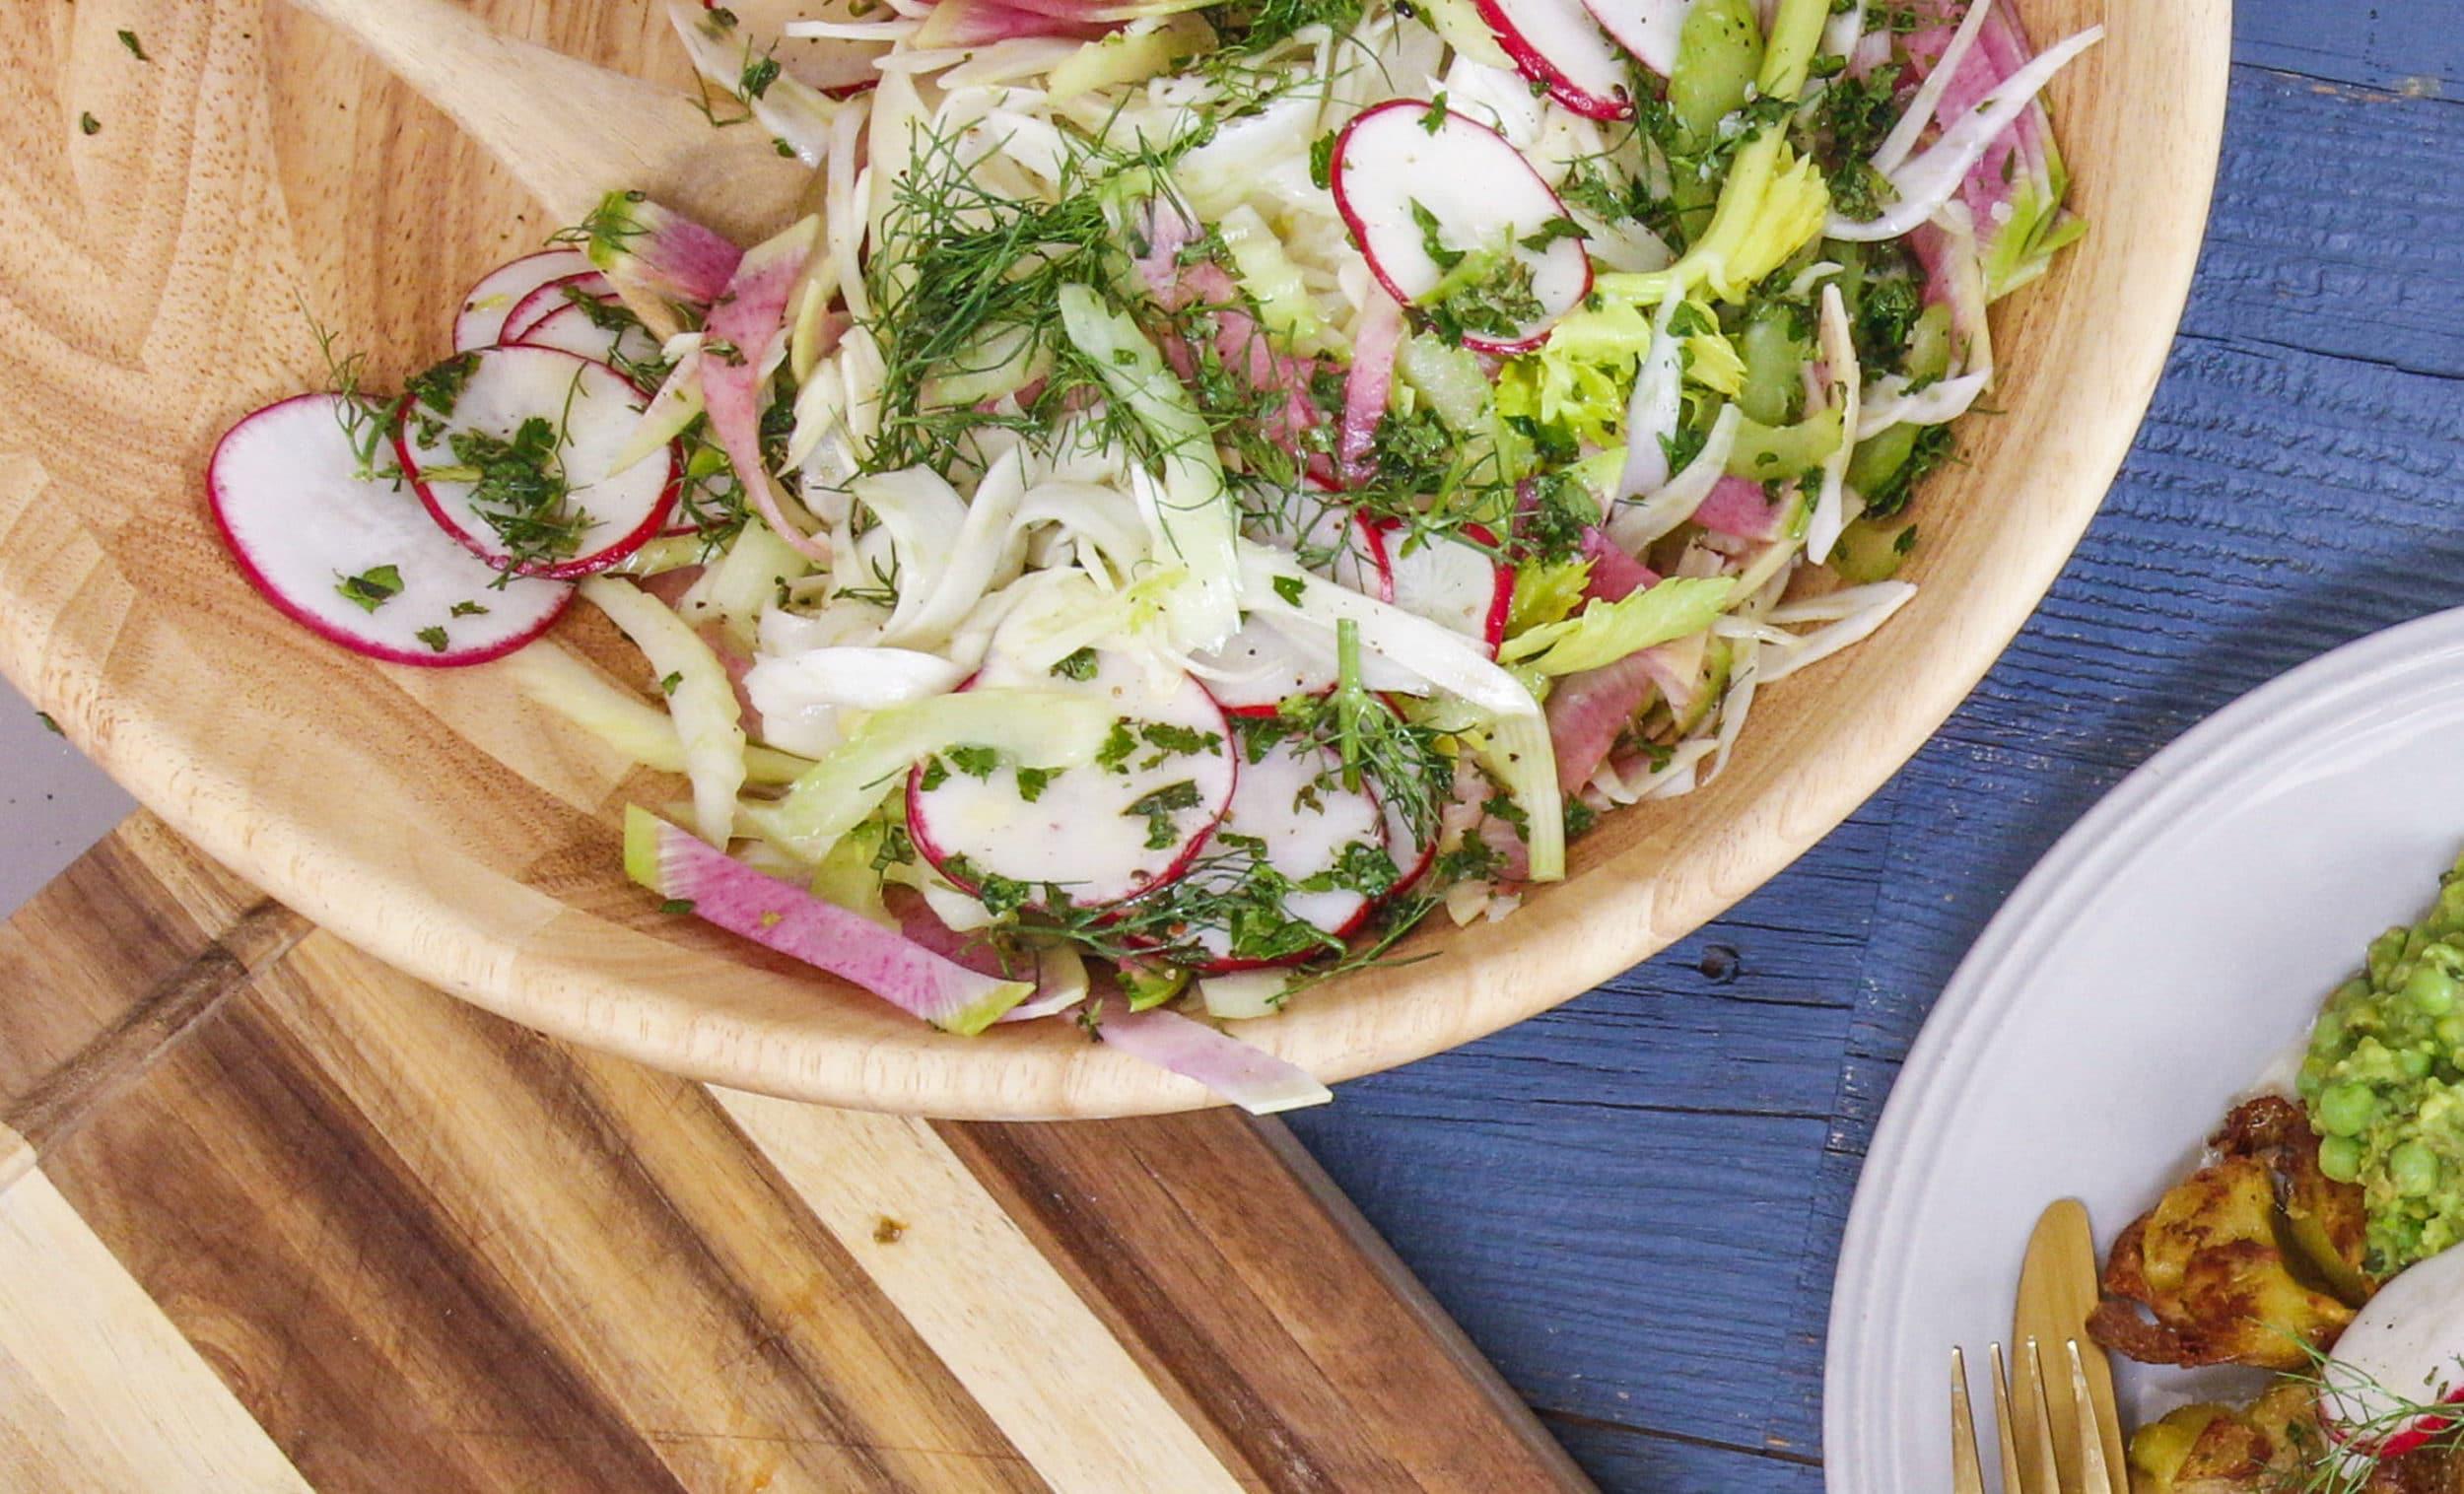 Rachael's Radish, Fennel and Celery Salad